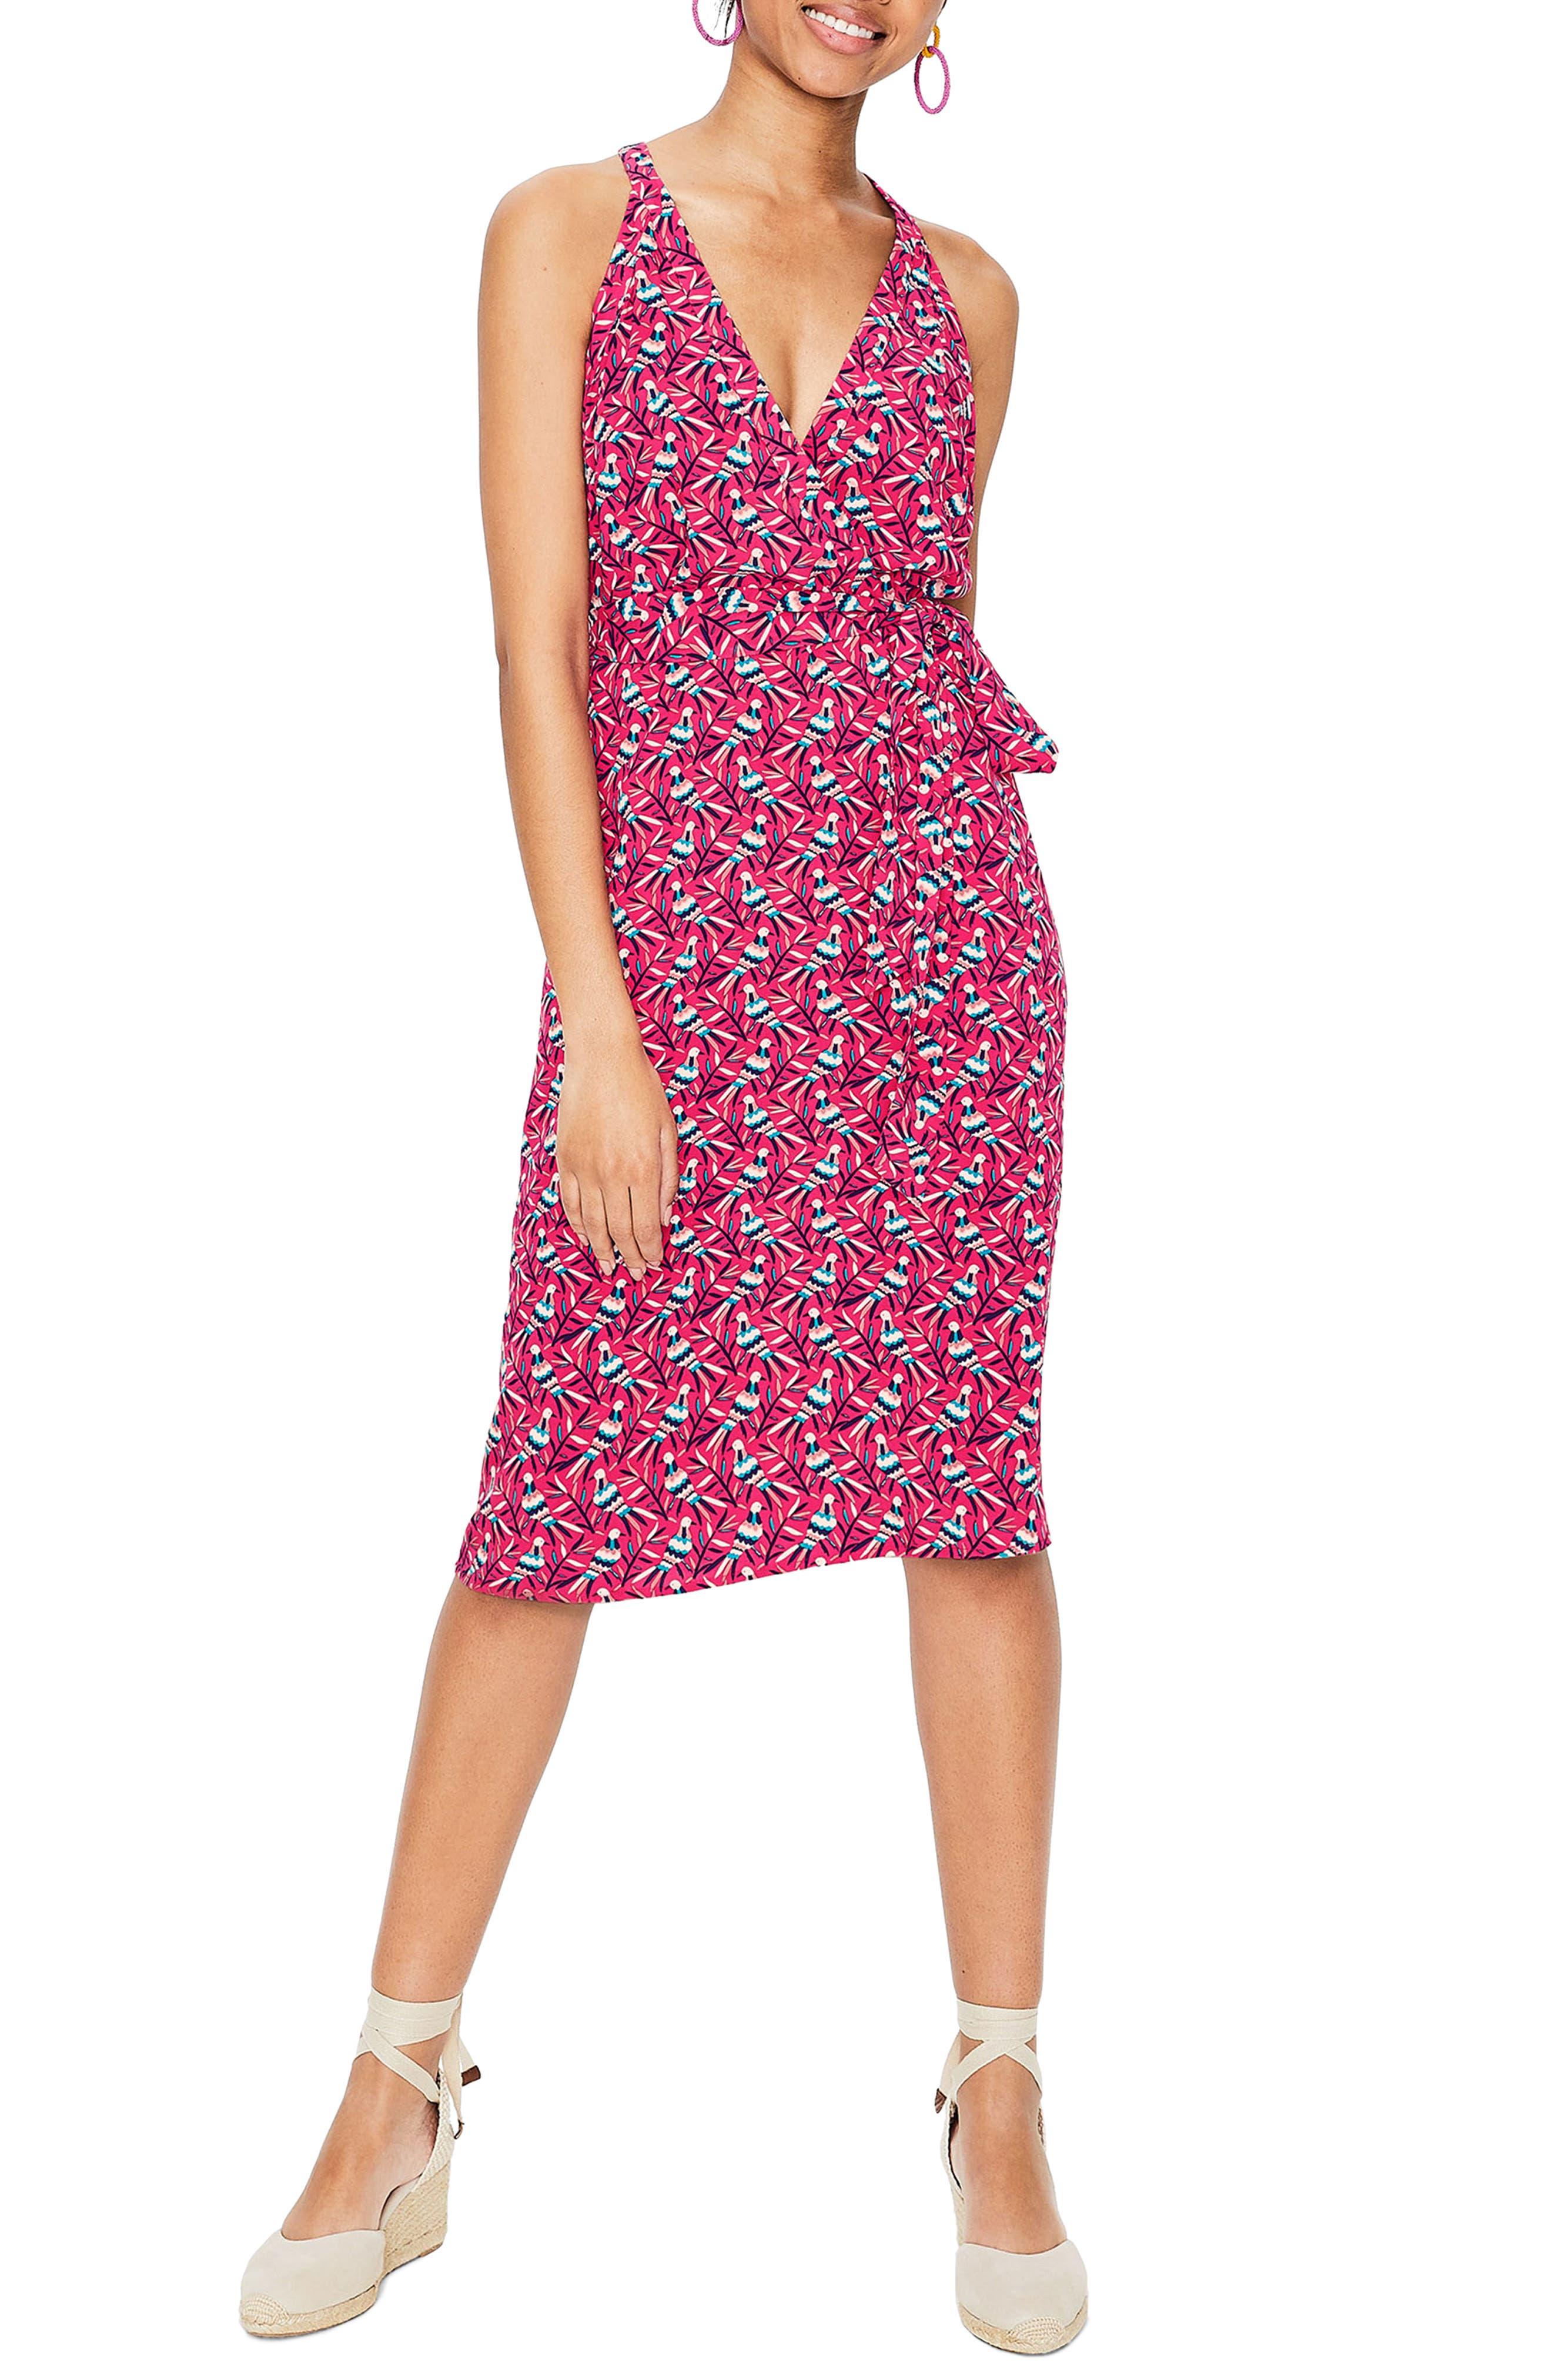 Boden Olwen Print Halter Dress, Pink